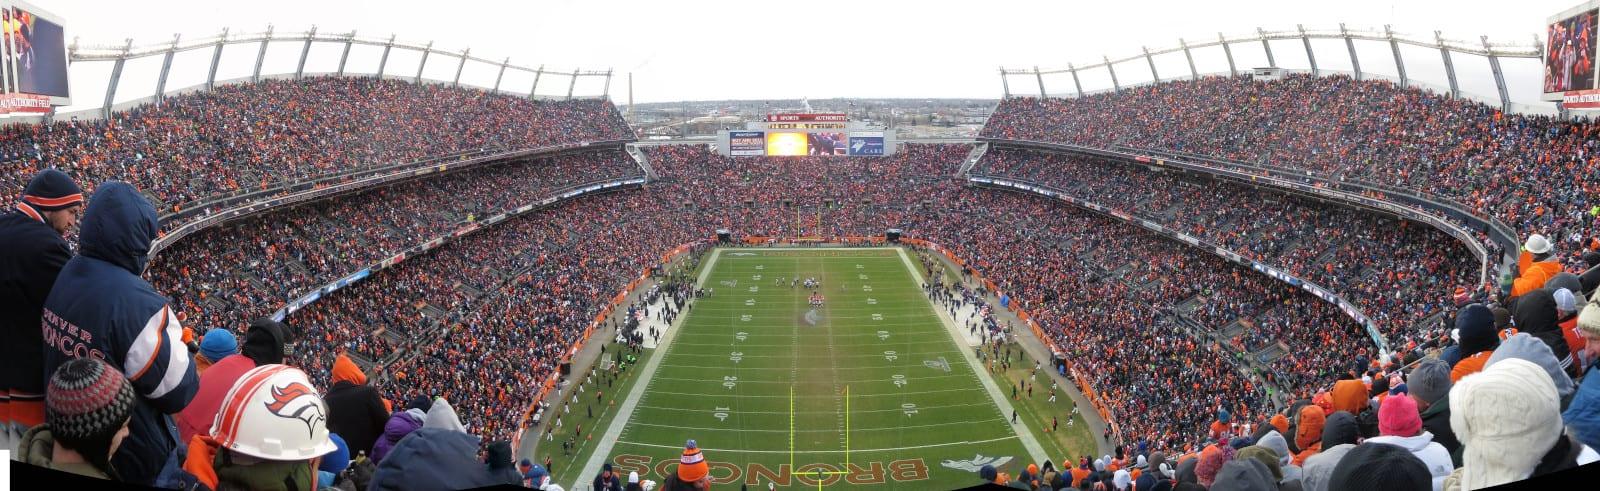 Mile High Stadium Denver Broncos vs Ravens 2013 Playoff Game